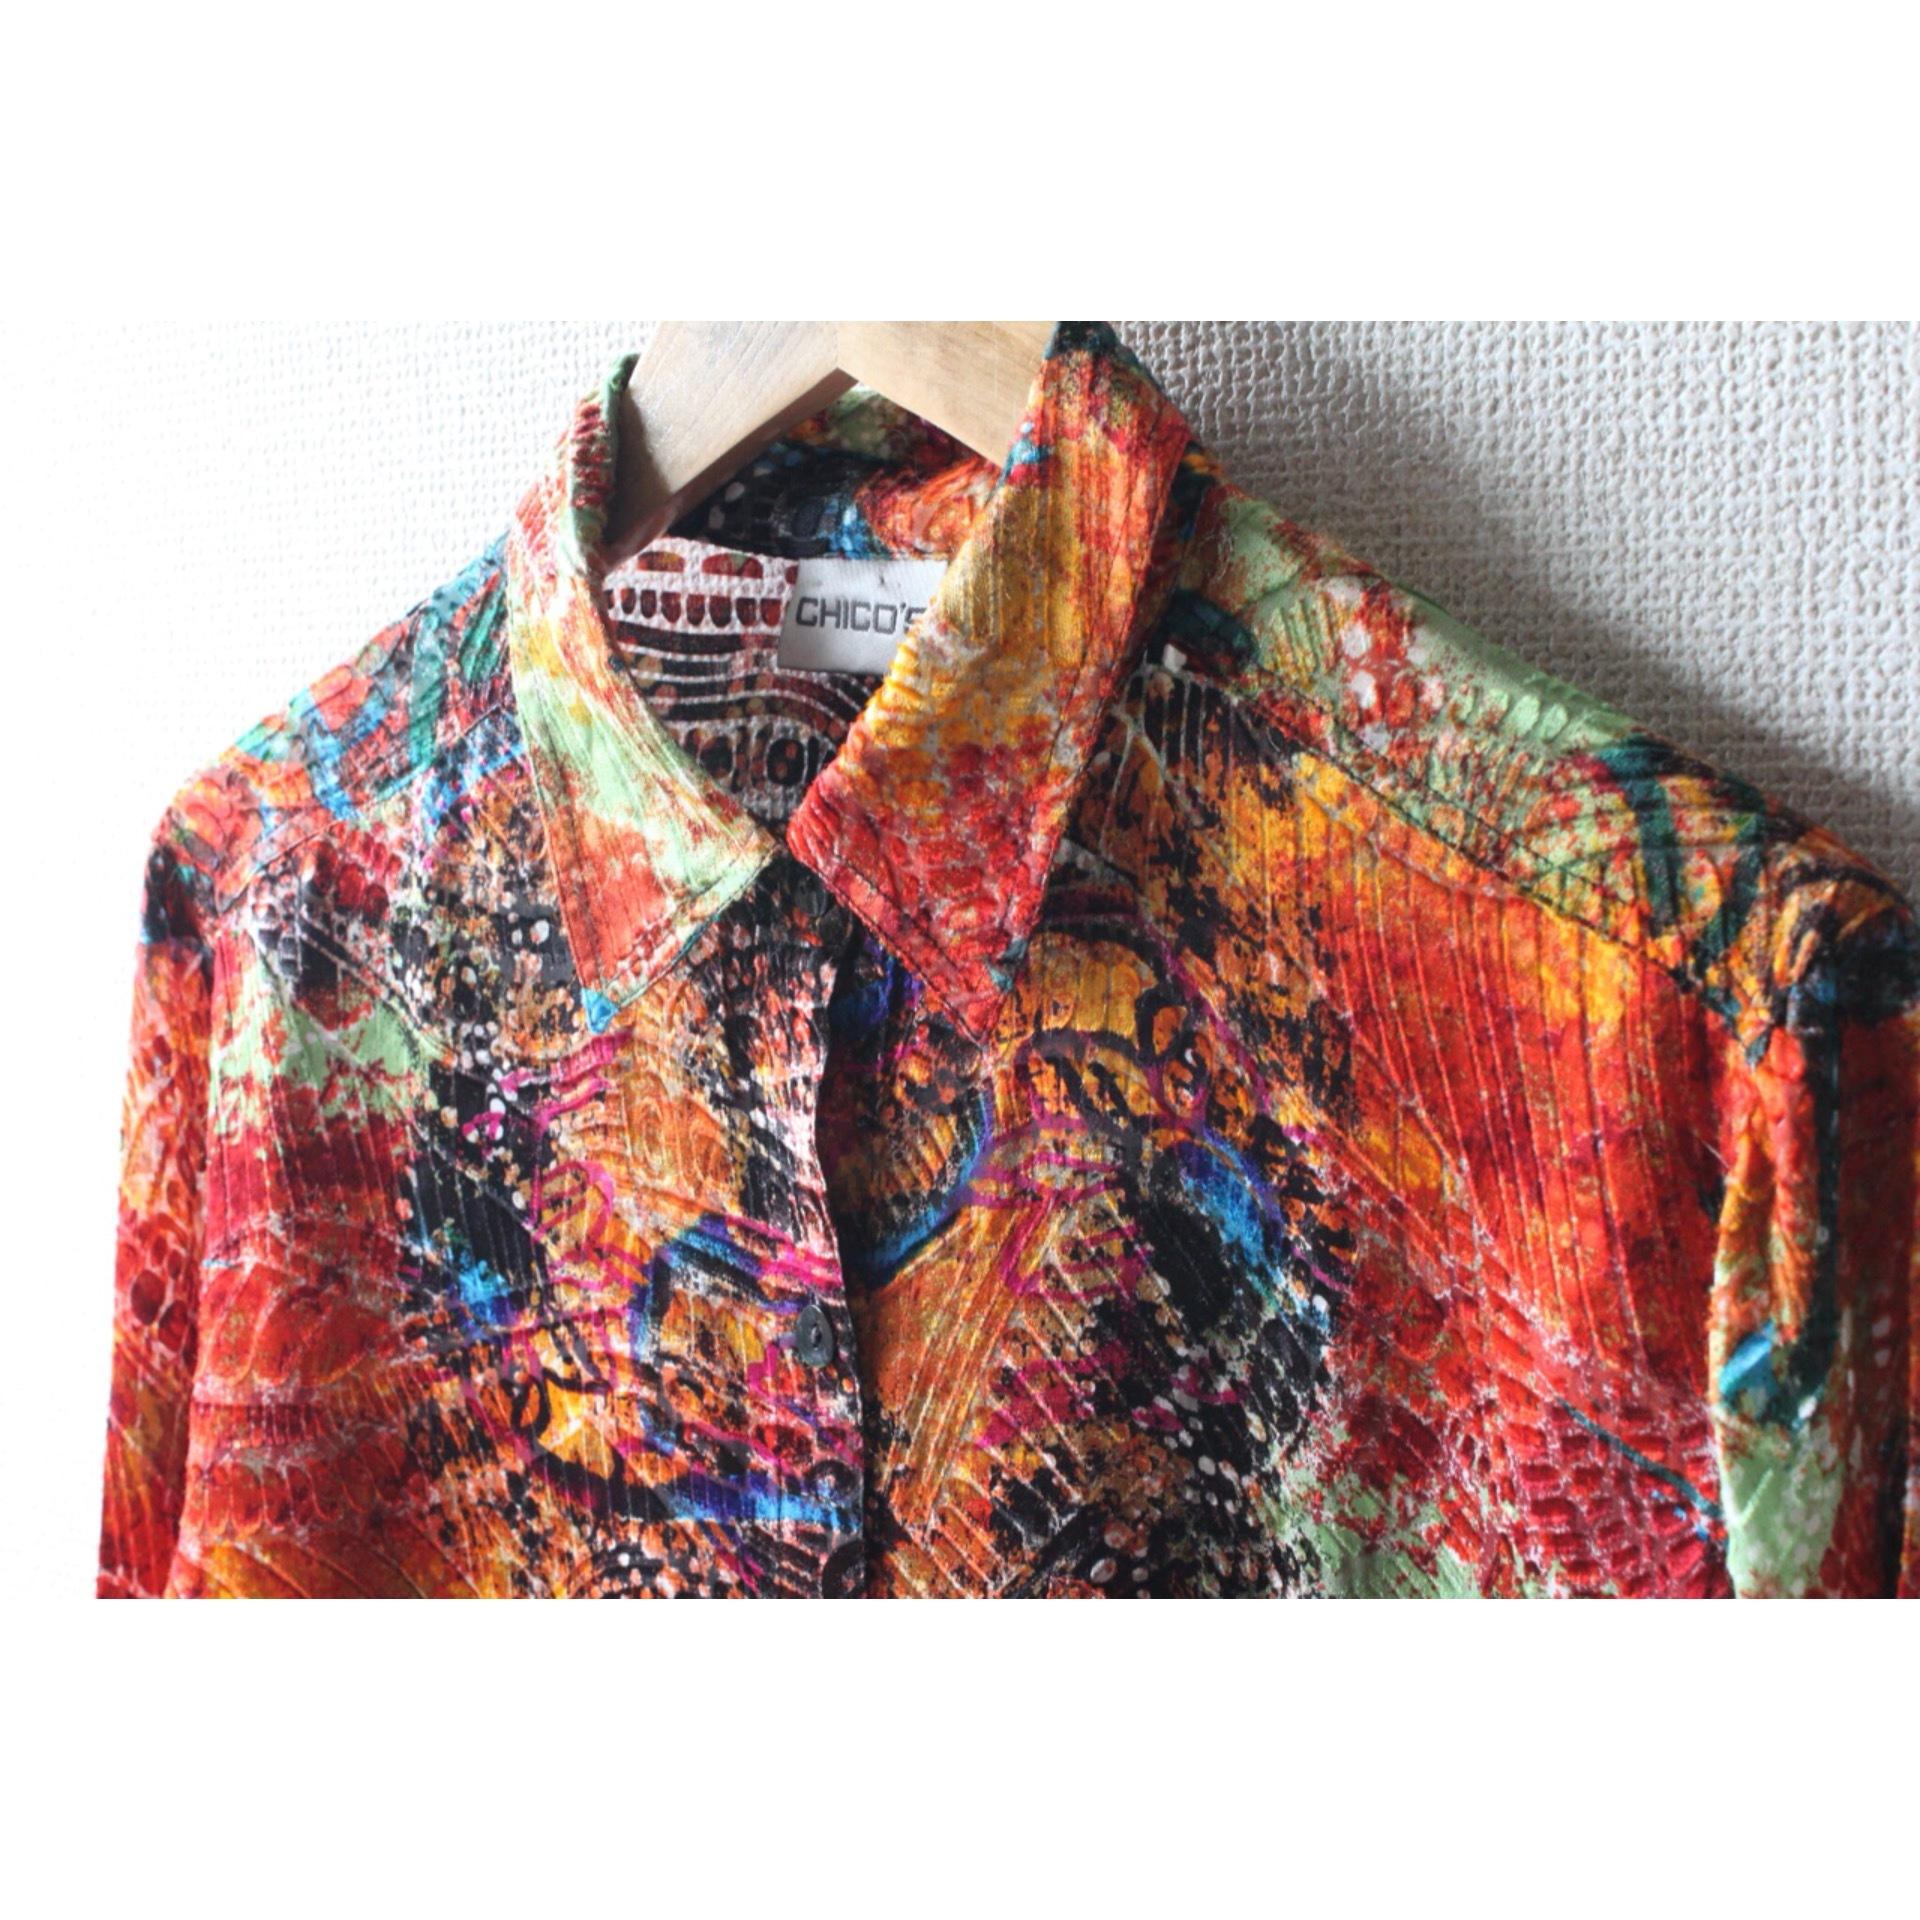 Vintage see through shirt